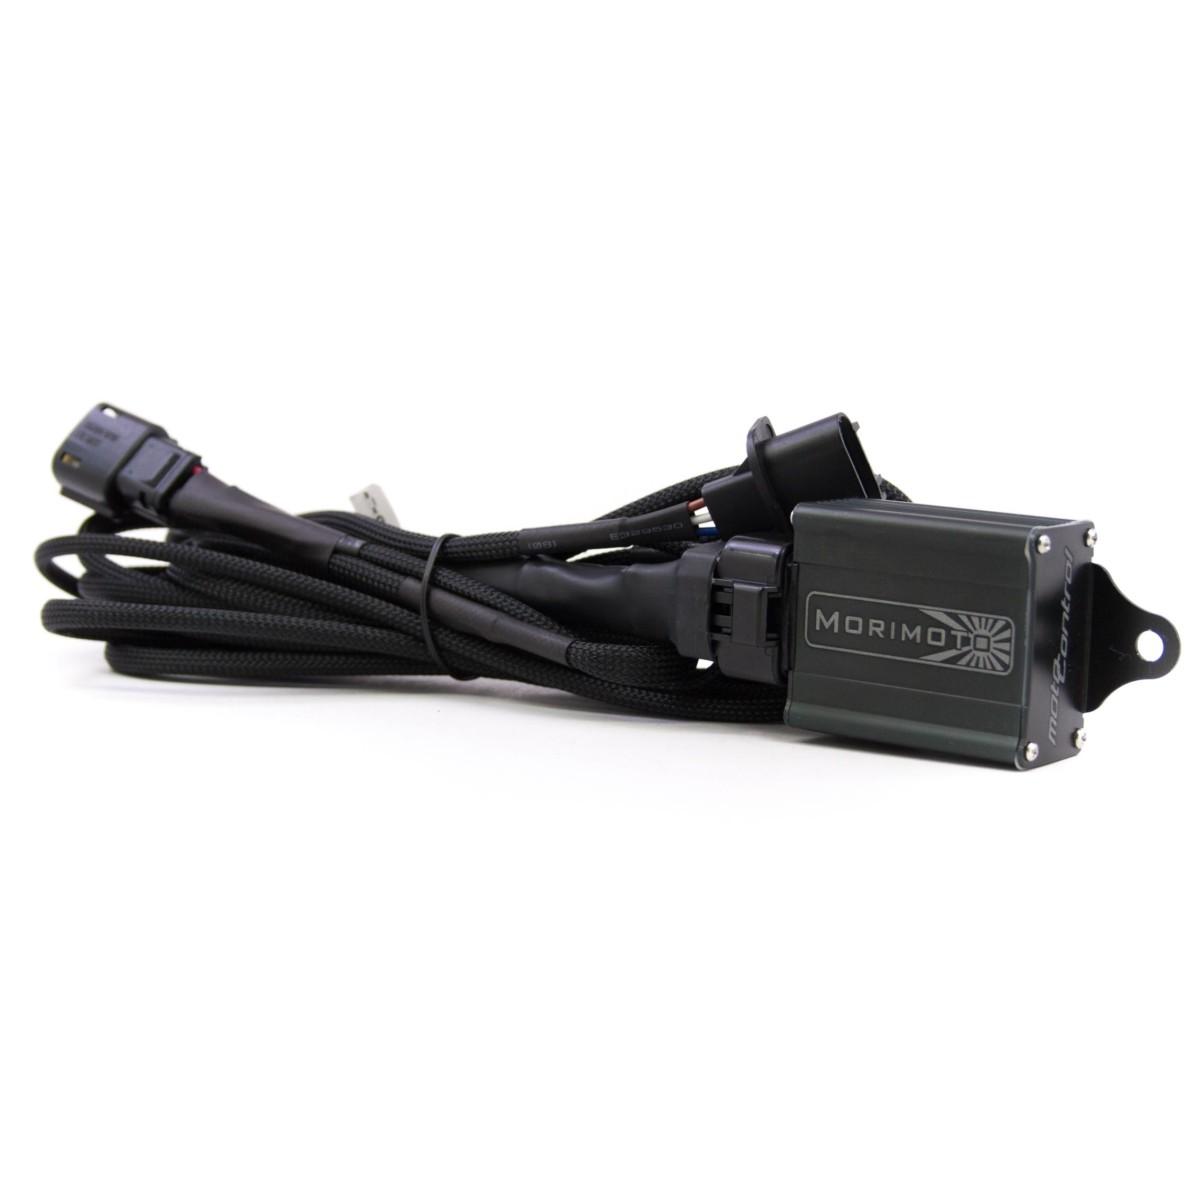 morimoto f150 oem hid conversion harness (2009 2014) hid kit h4 hid wiring morimoto f150 oem hid conversion harness (2009 2014)